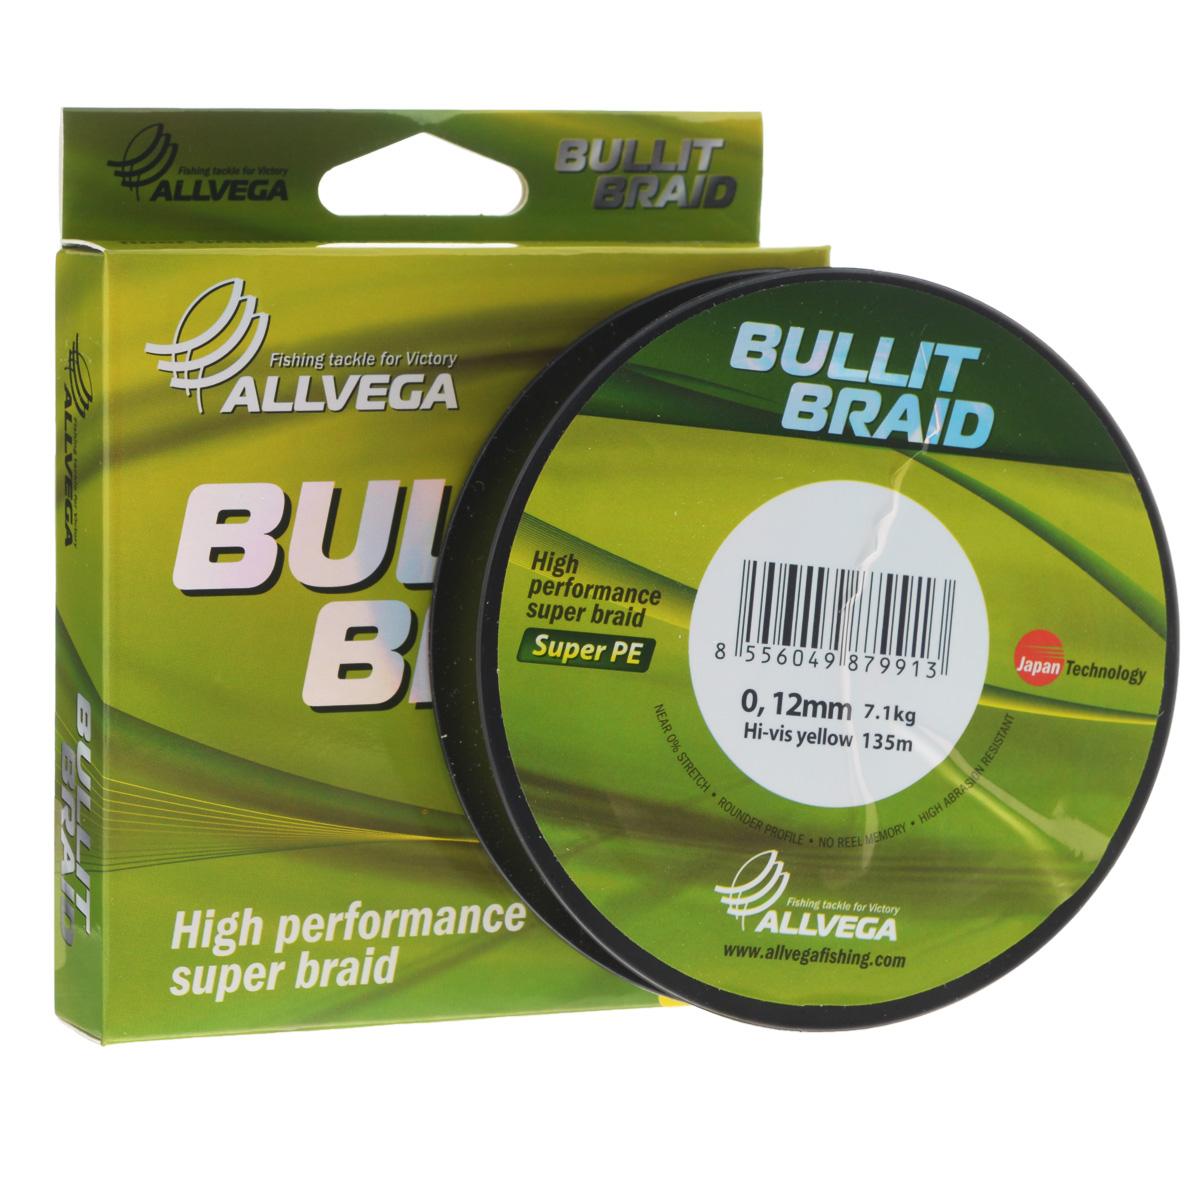 Леска плетеная Allvega Bullit Braid, цвет: ярко-желтый, 135 м, 0,12 мм, 7,1 кг